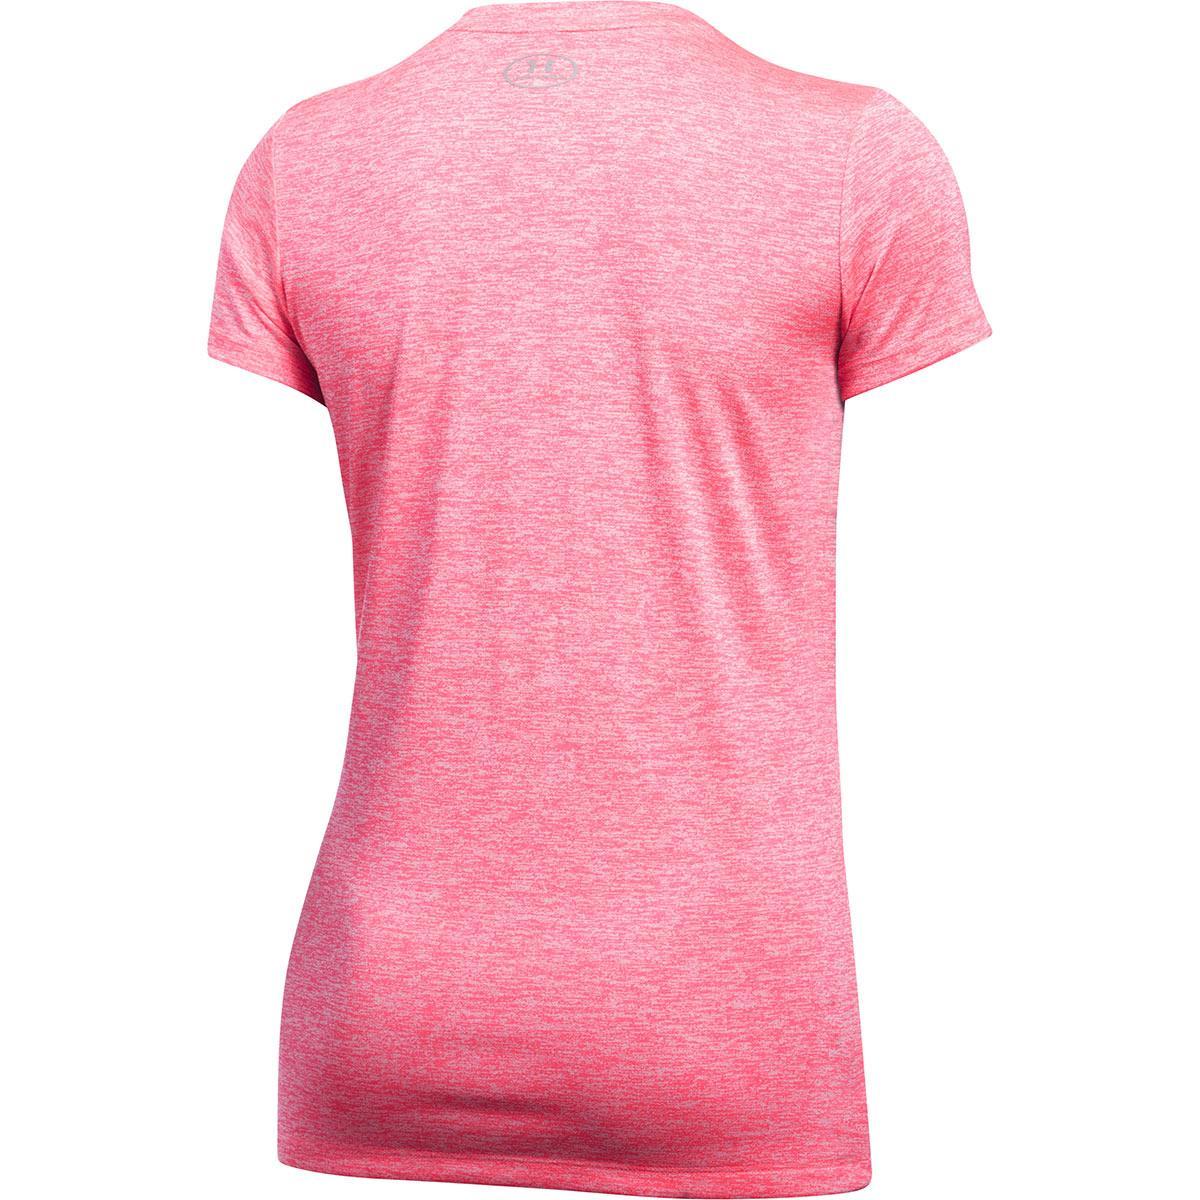 ... Under Armour Ladies Twist Tech Tee Pink Shock - Back ... d2cb622c8b9